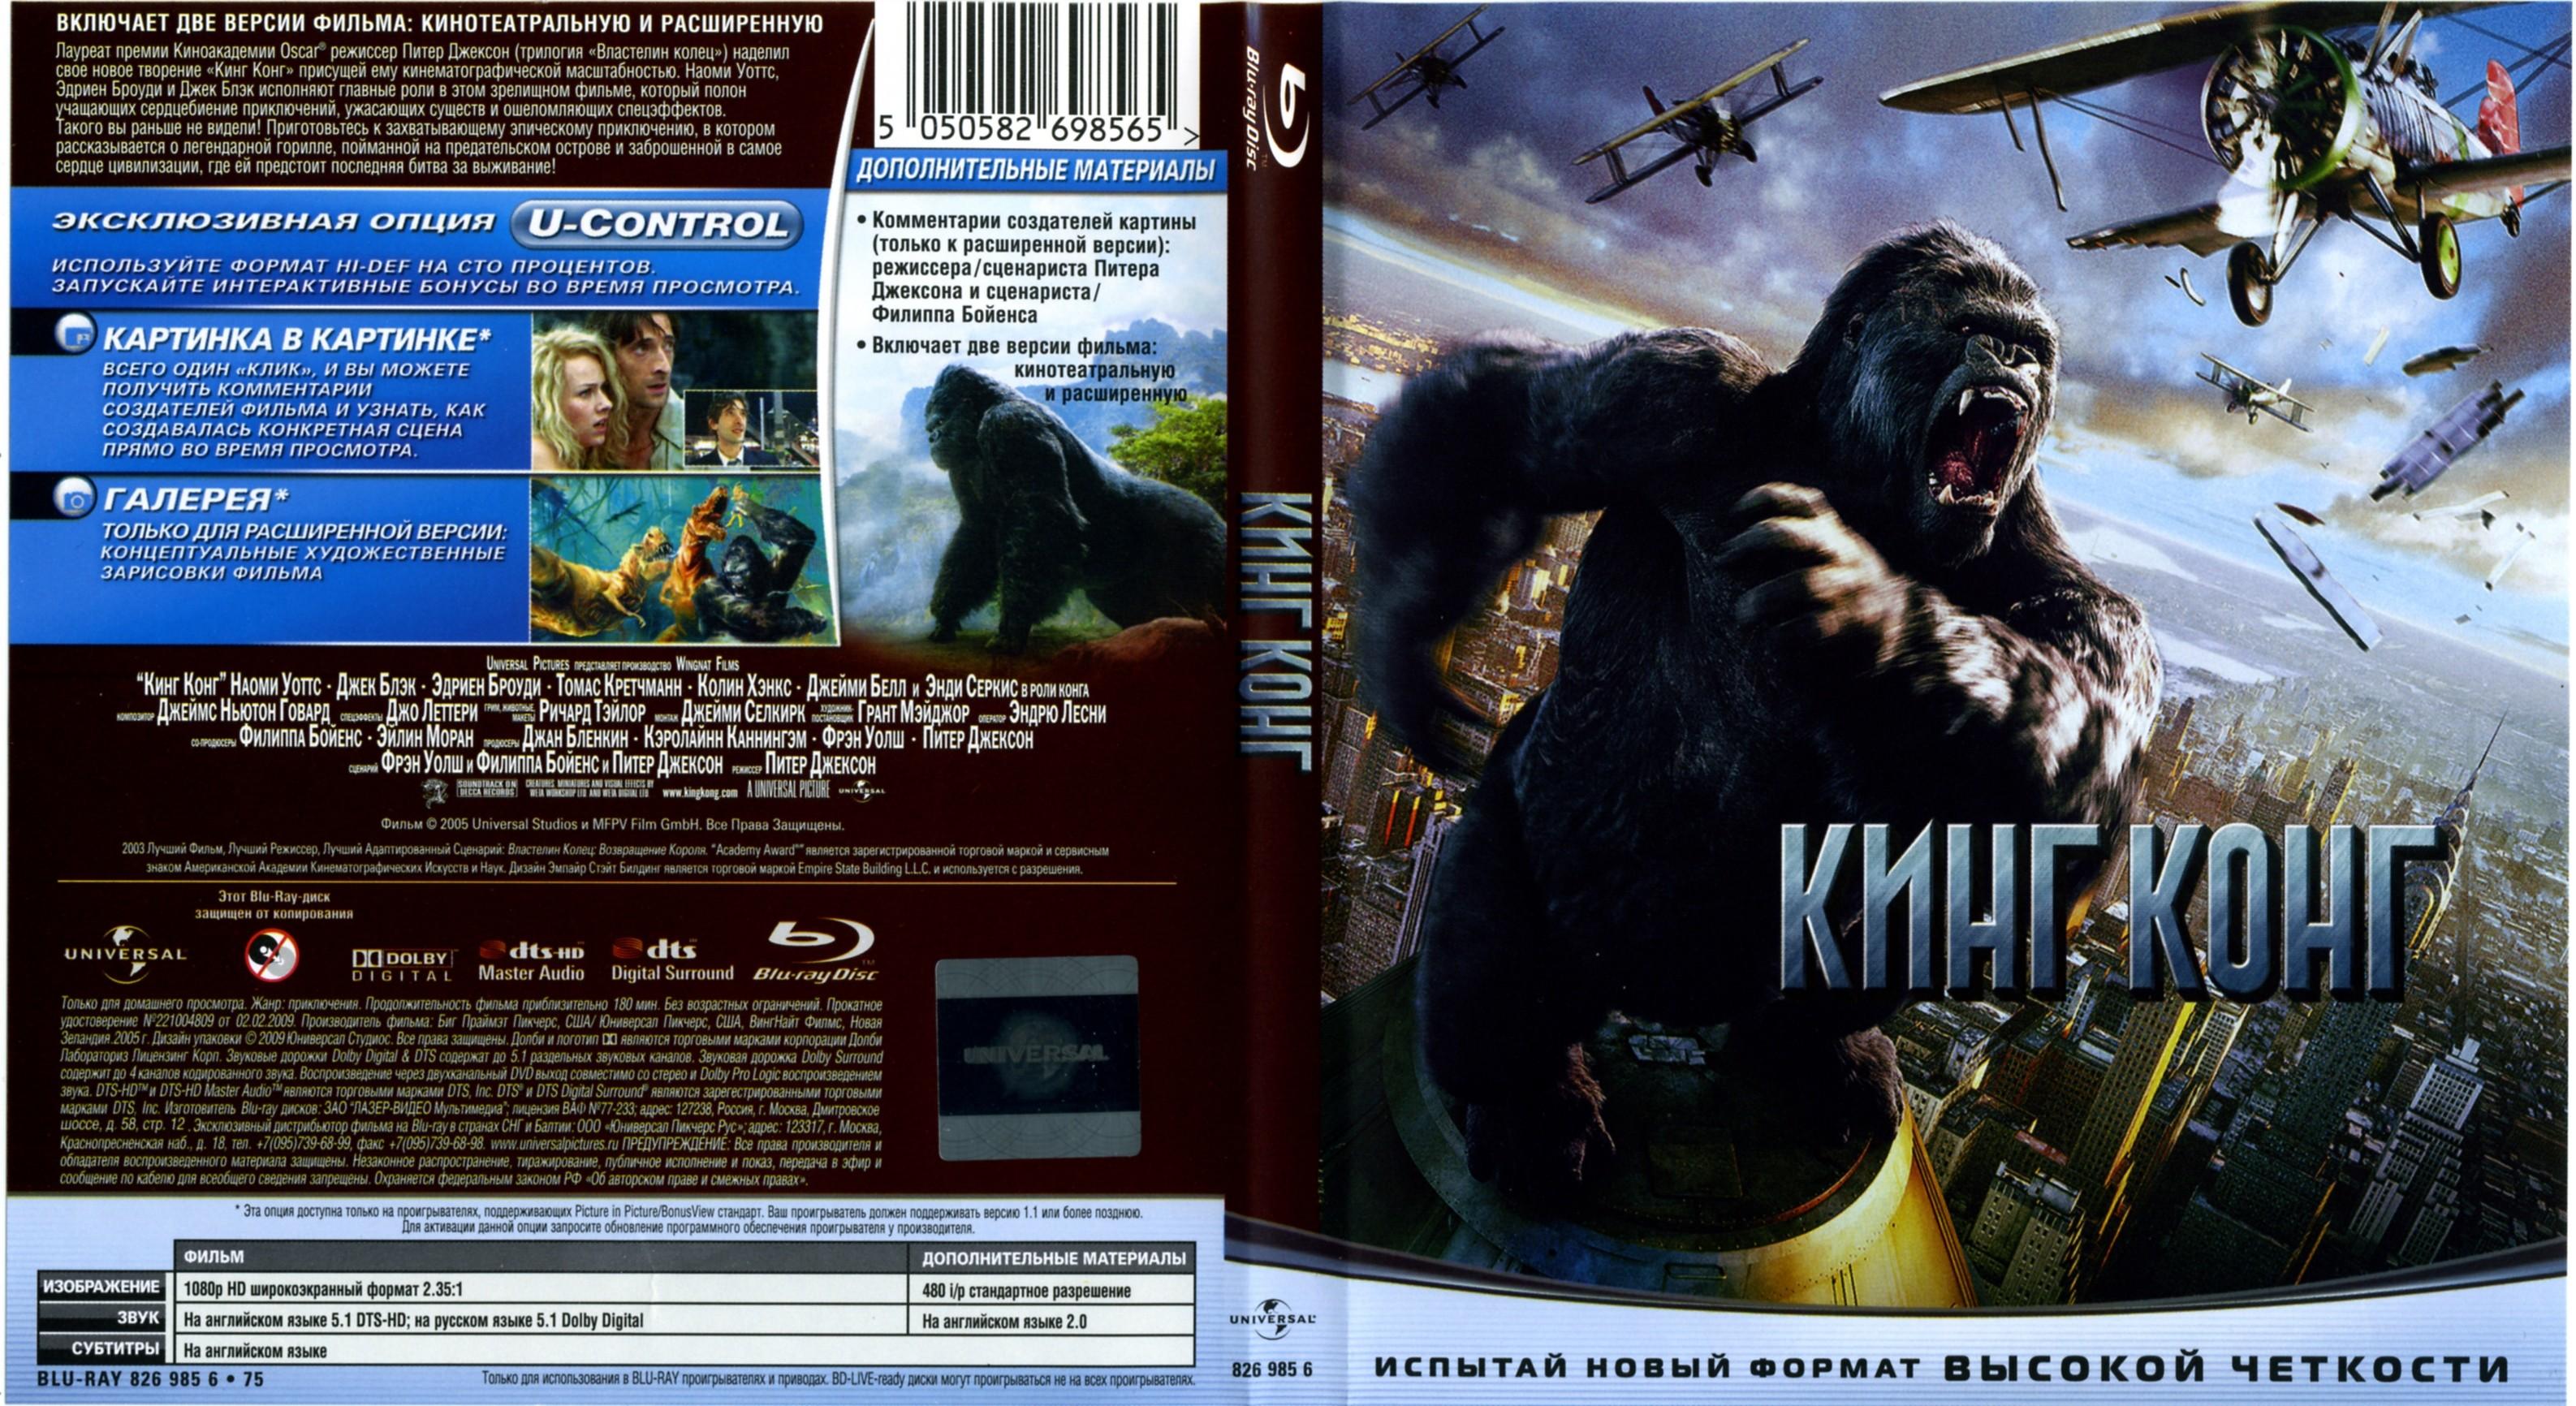 COVERS BOX SK ::: King Kong 2005 [IMDB-DL] - high quality